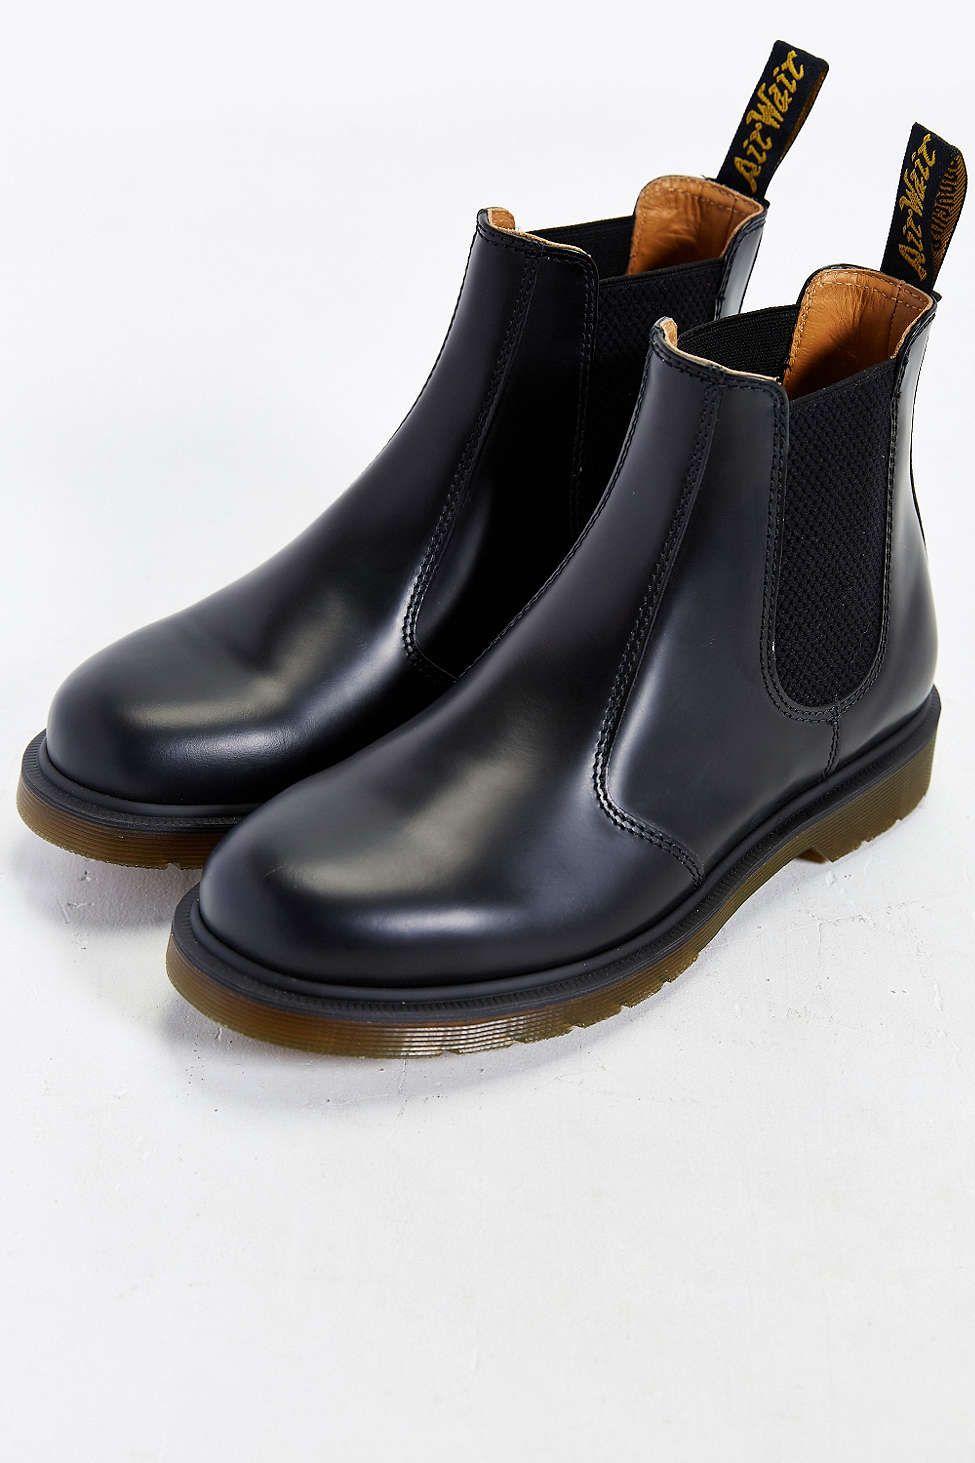 079fe499fa26 Dr. Martens 2976 Chelsea Boot